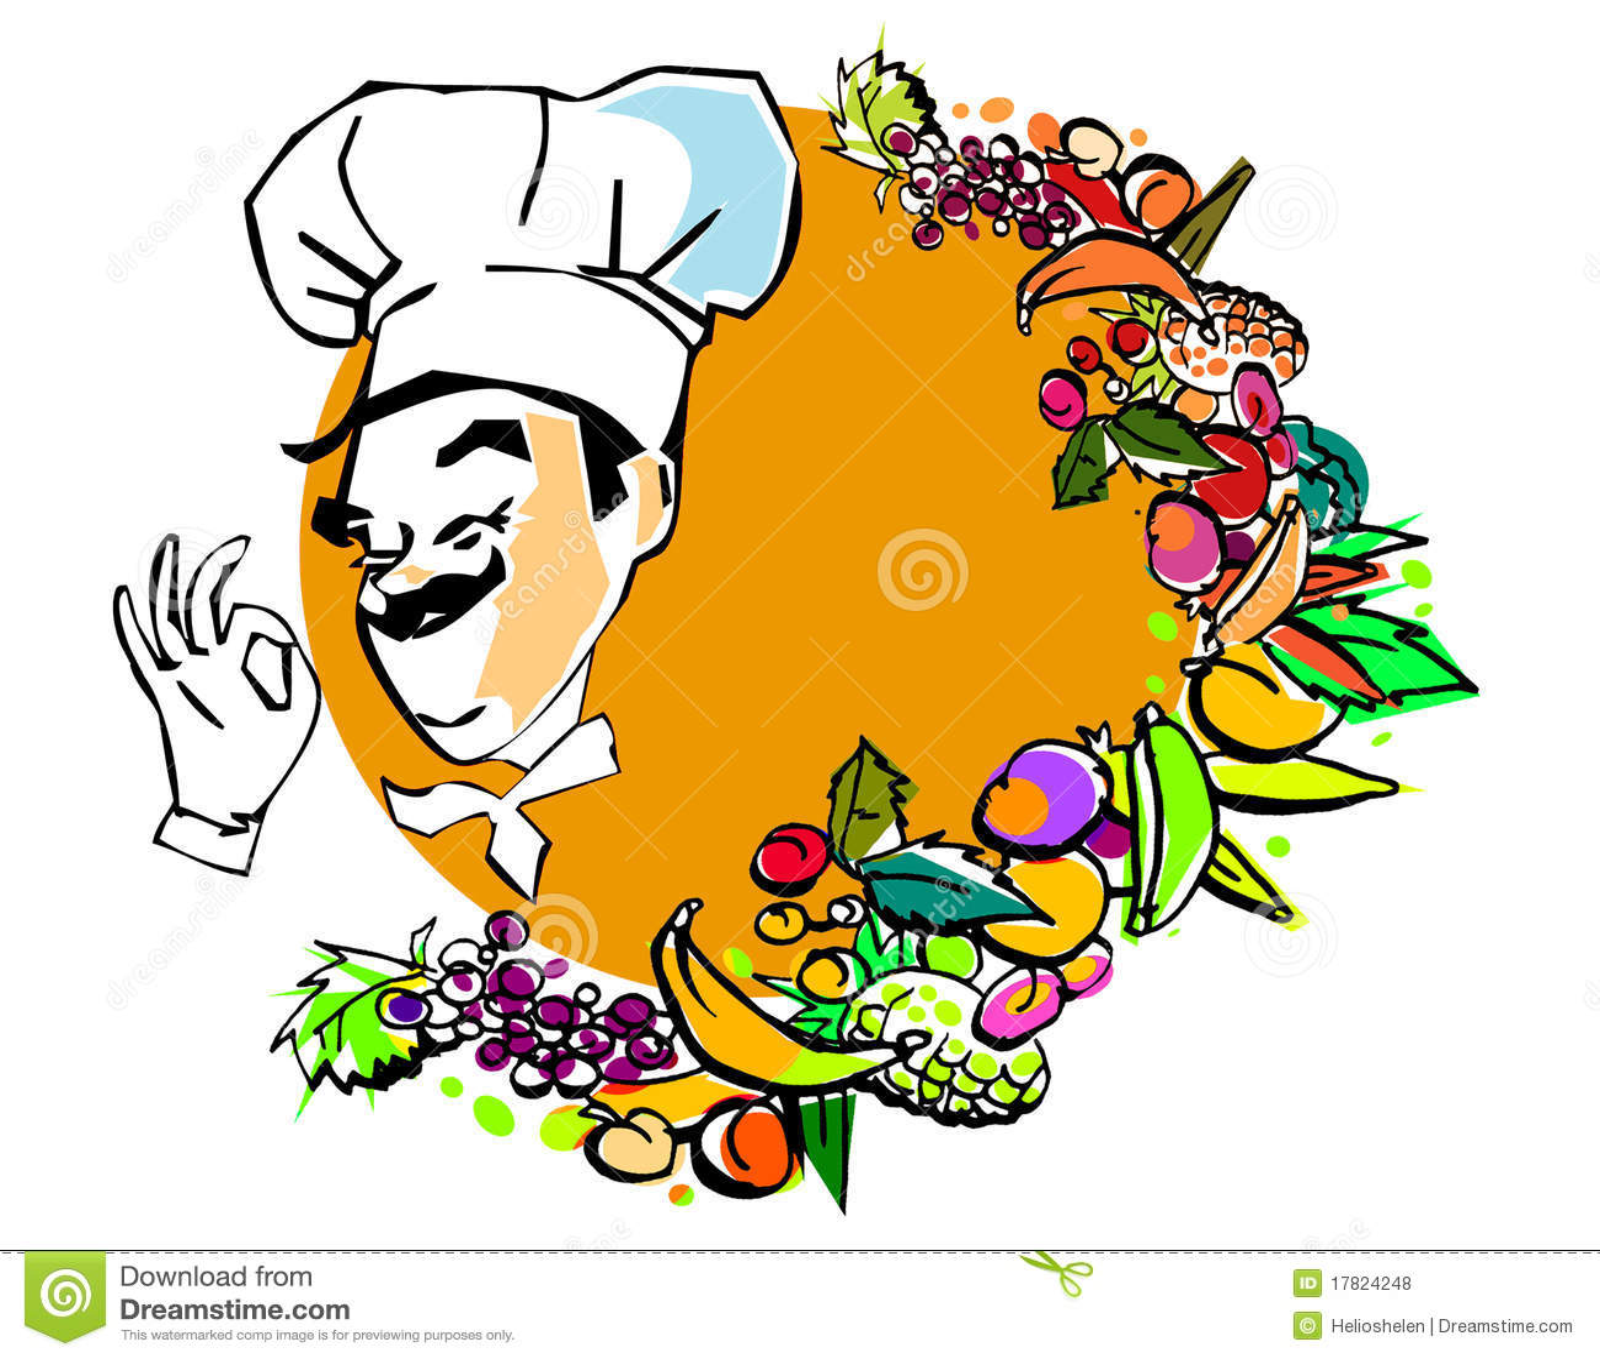 Koch bei der arbeit clipart  Jobserie, Vegetarischer Koch Stock Abbildung - Illustration von koch ...